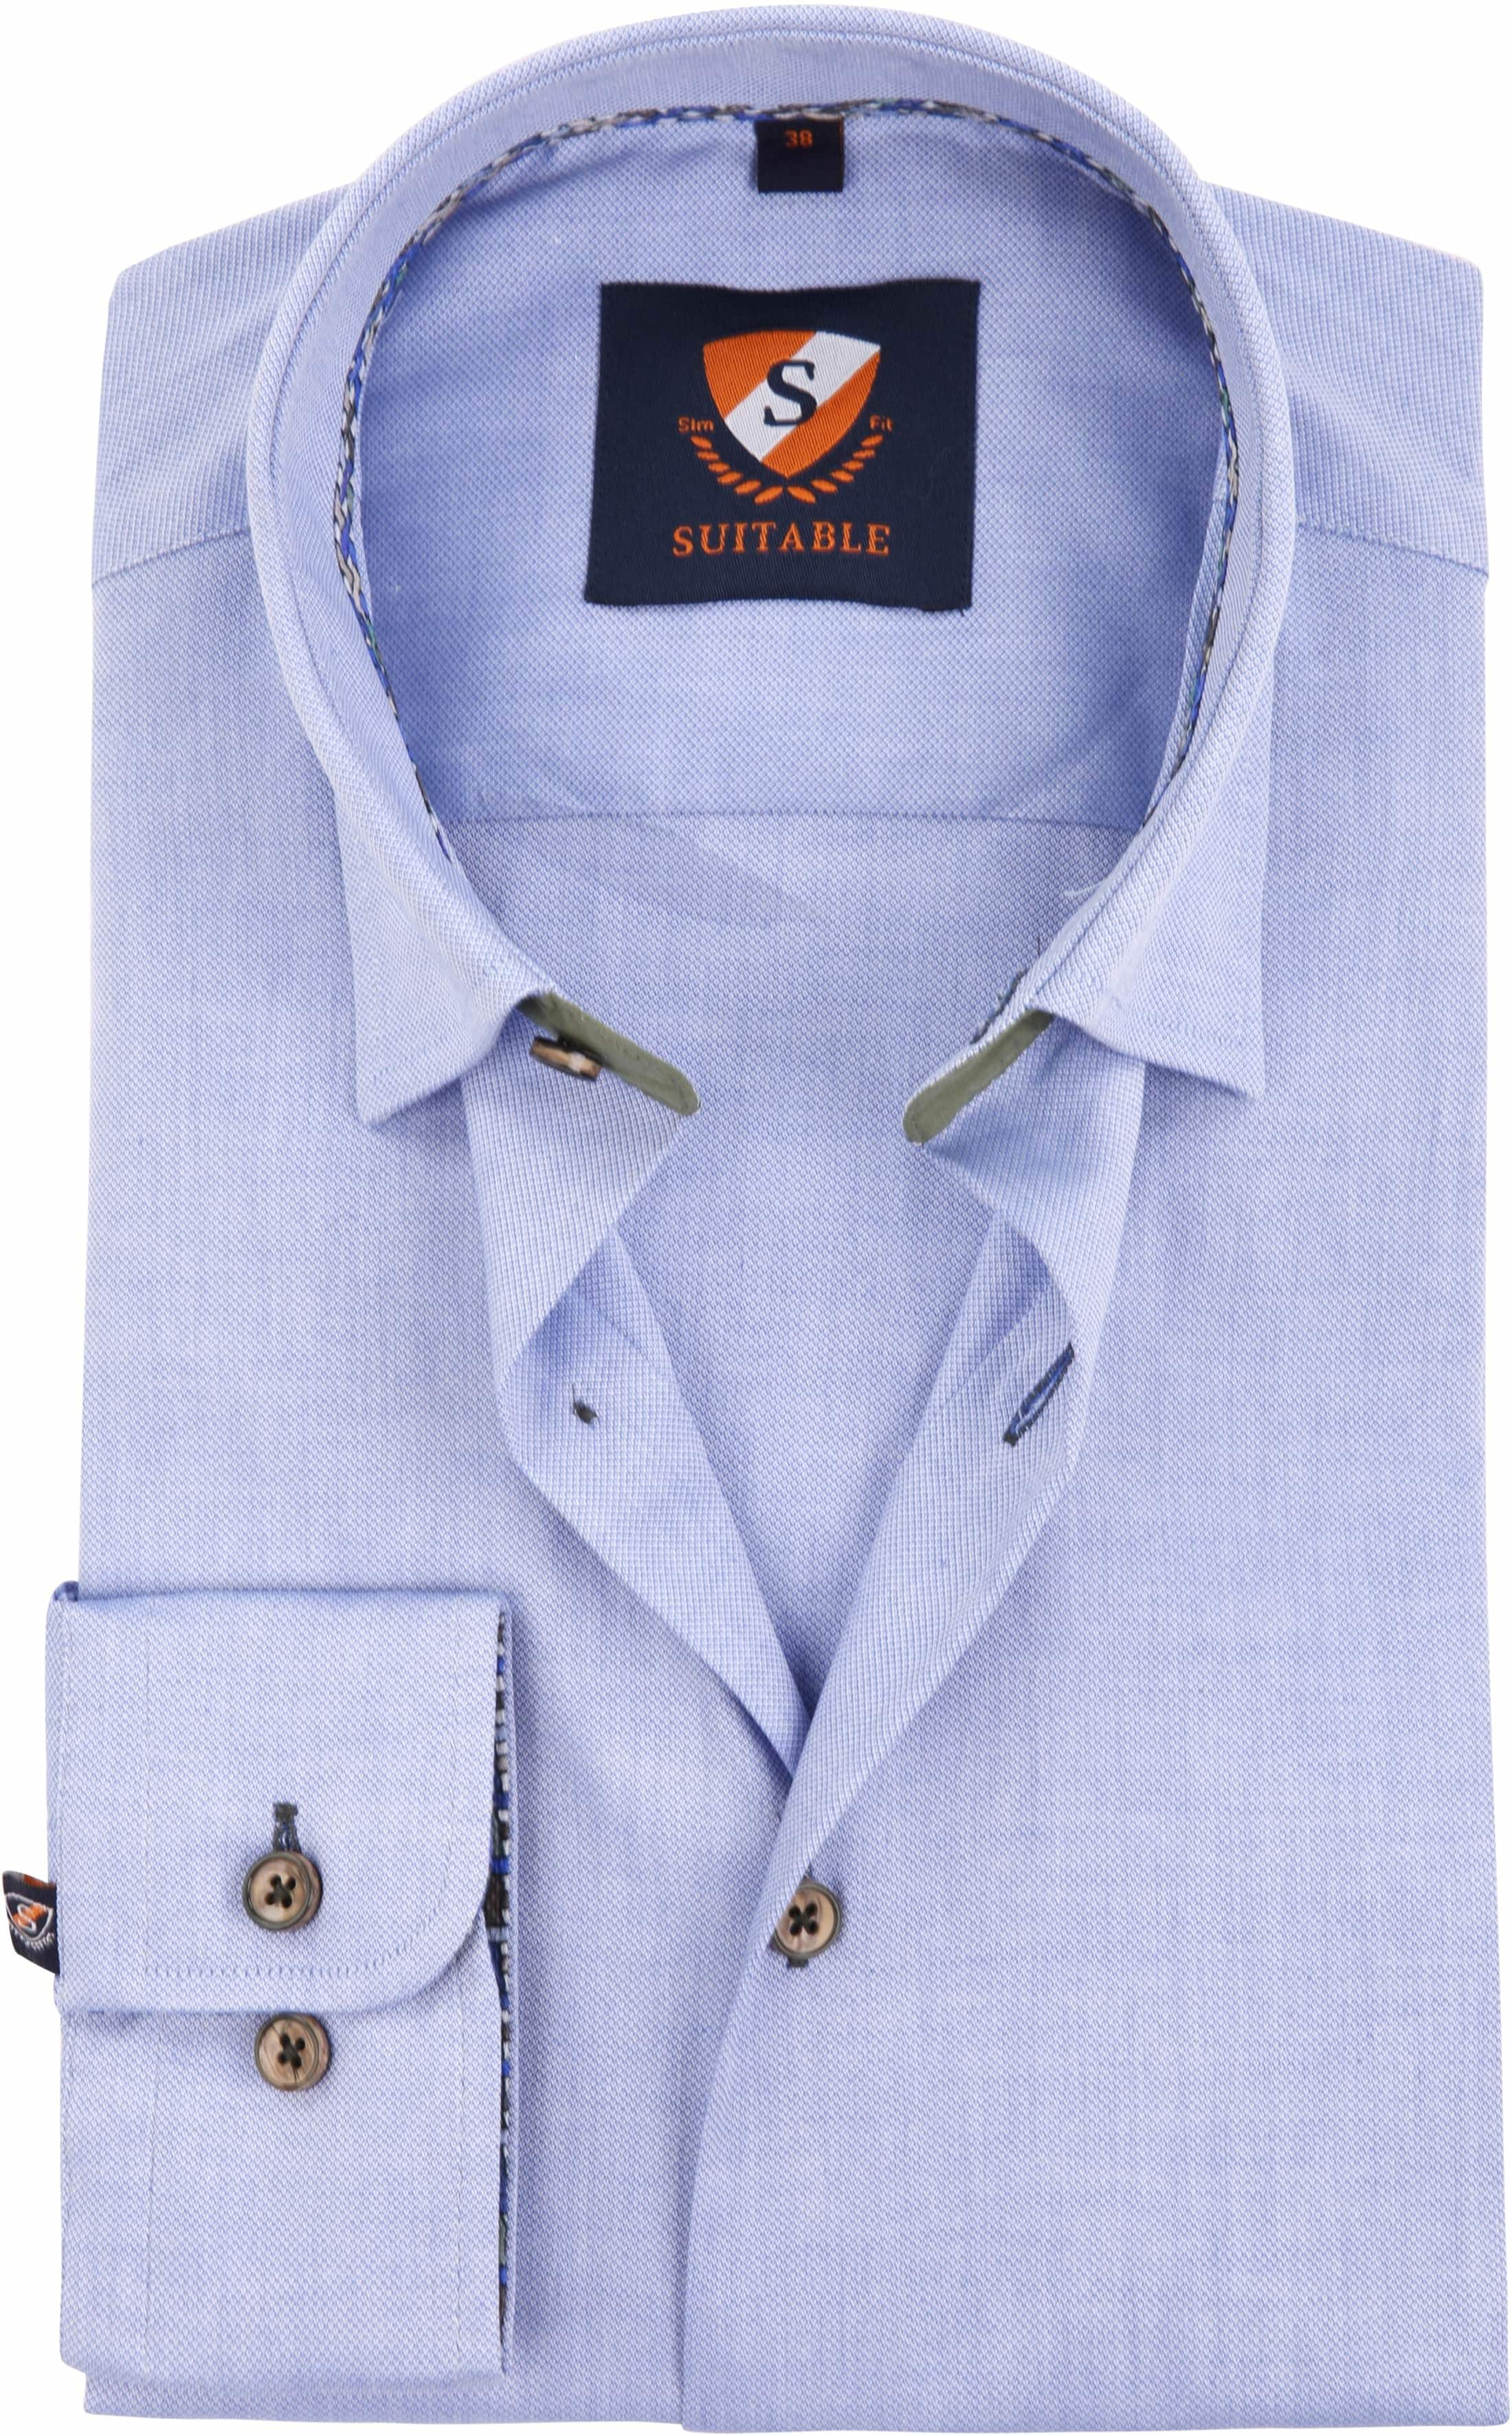 Suitable Overhemd Bluety foto 0